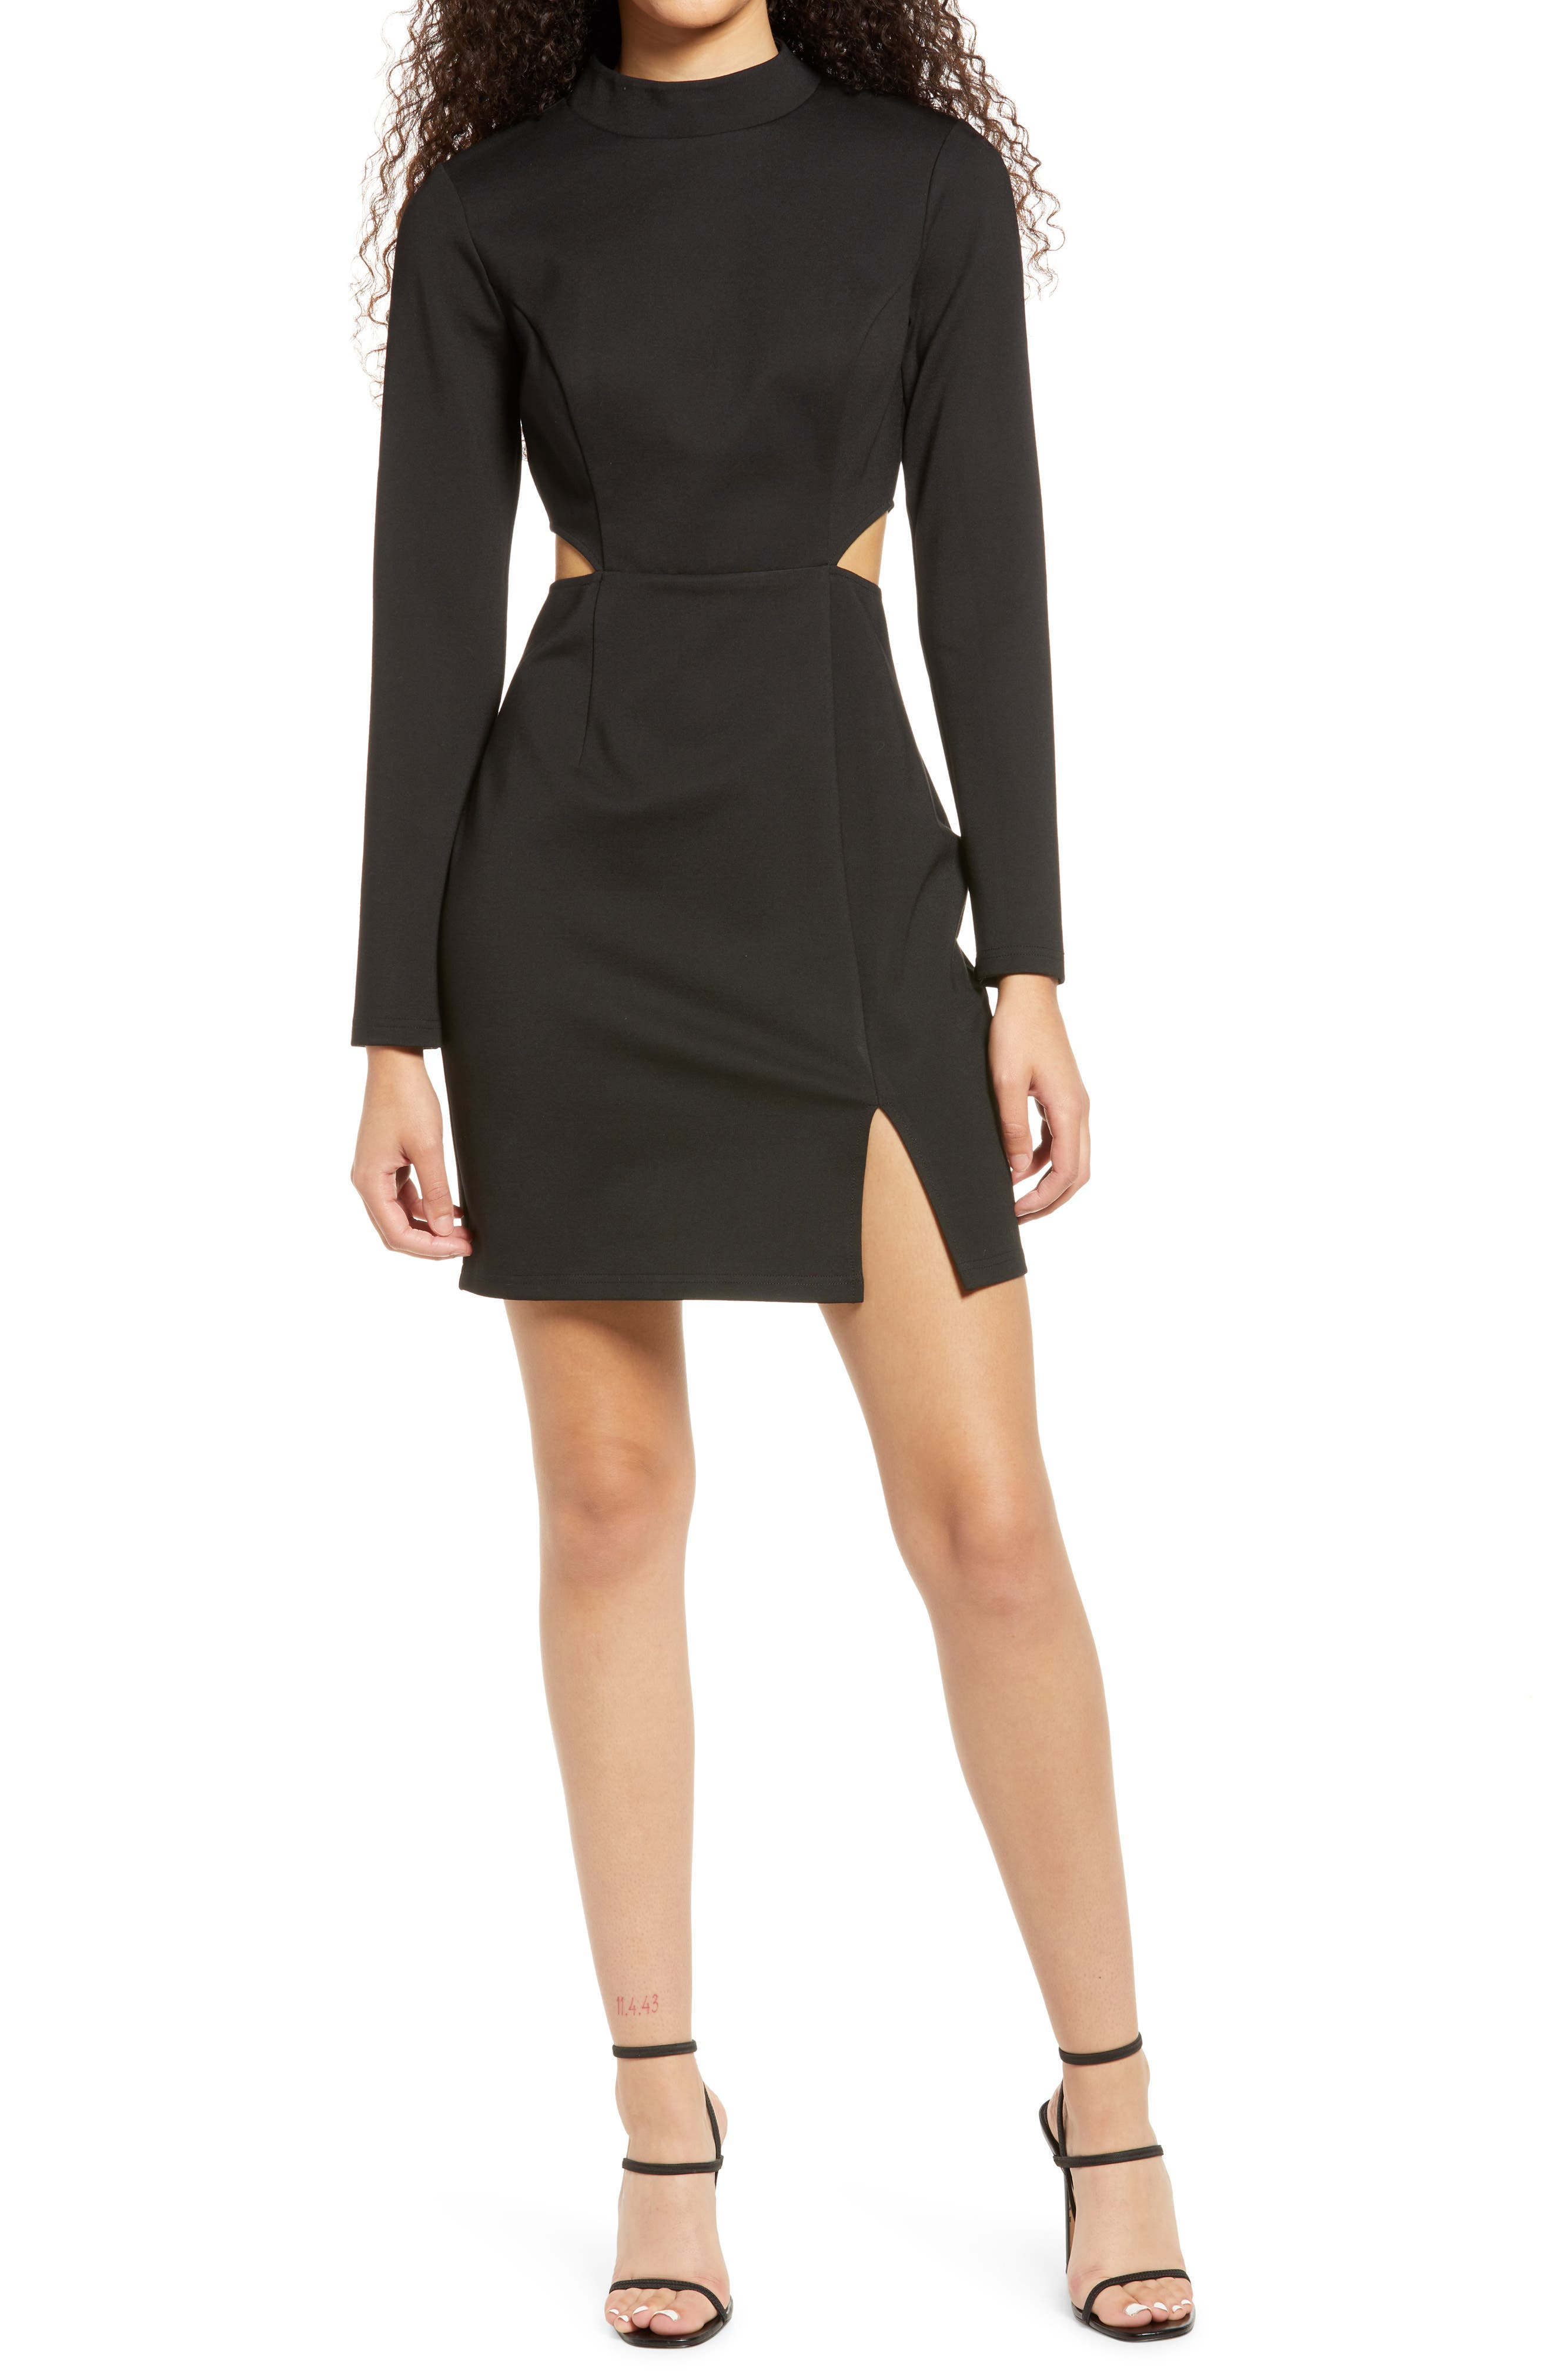 Awestruck Long Sleeve Cutout Dress